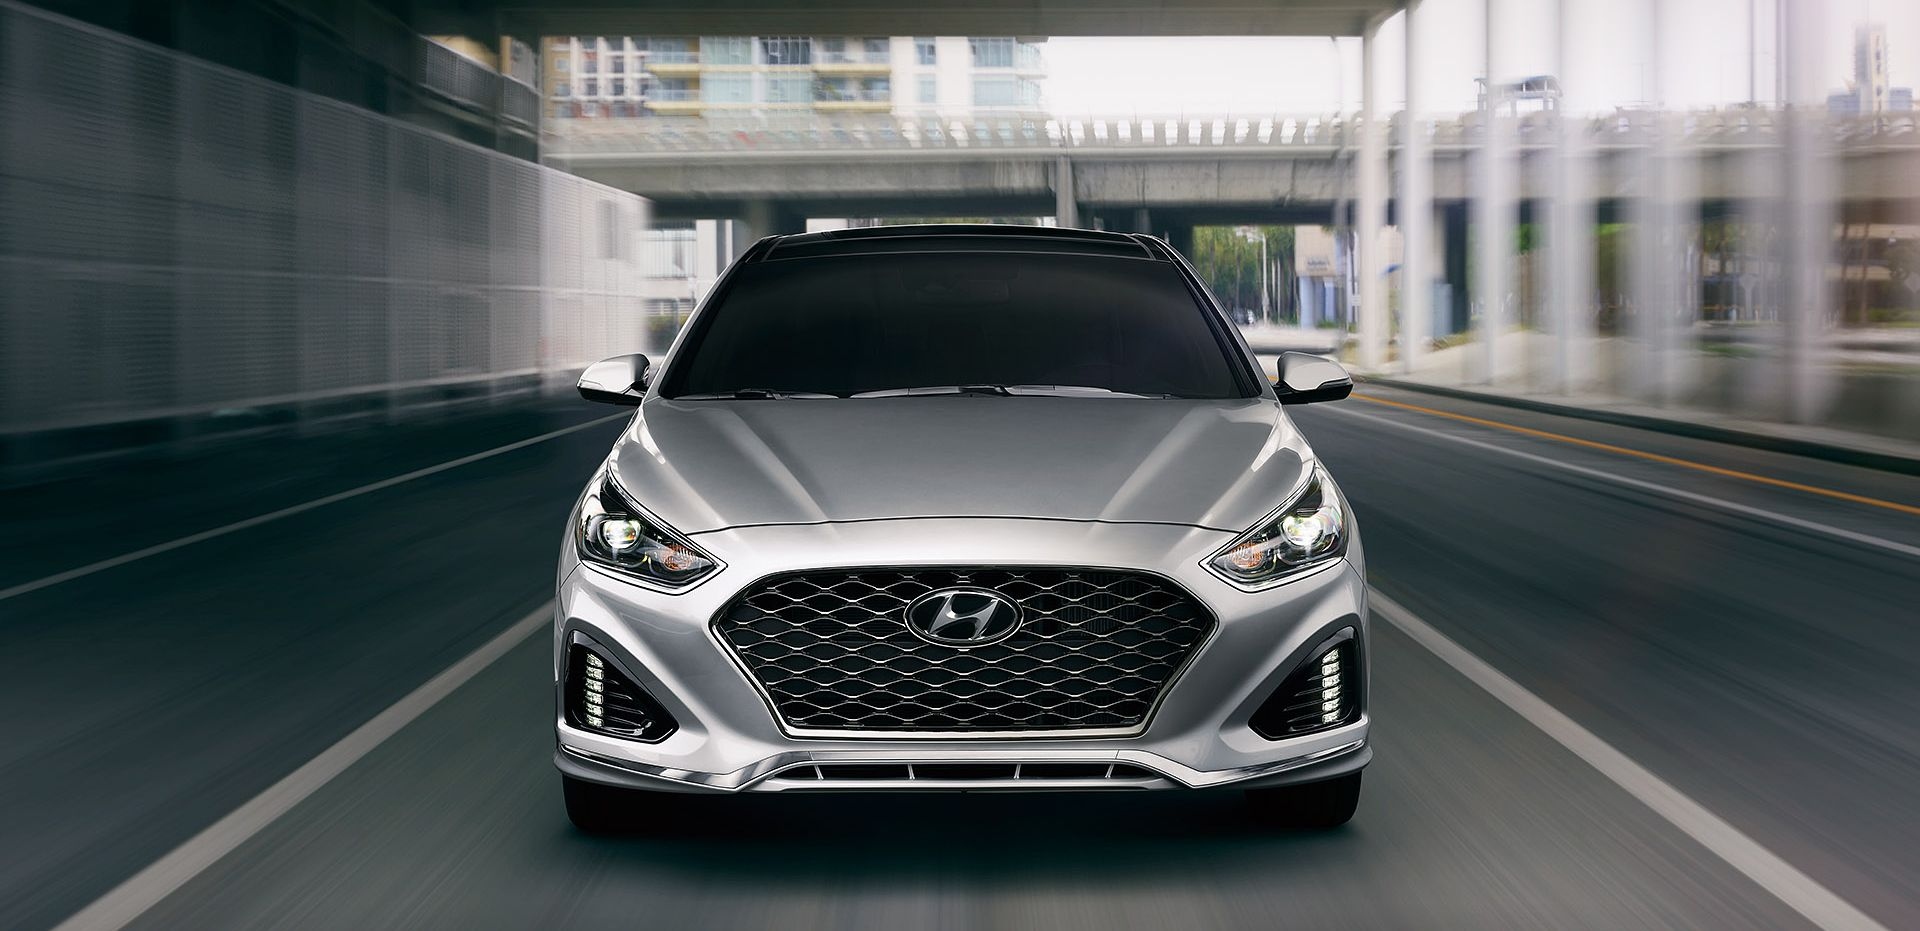 2019 Hyundai Sonata Leasing near College Park, MD